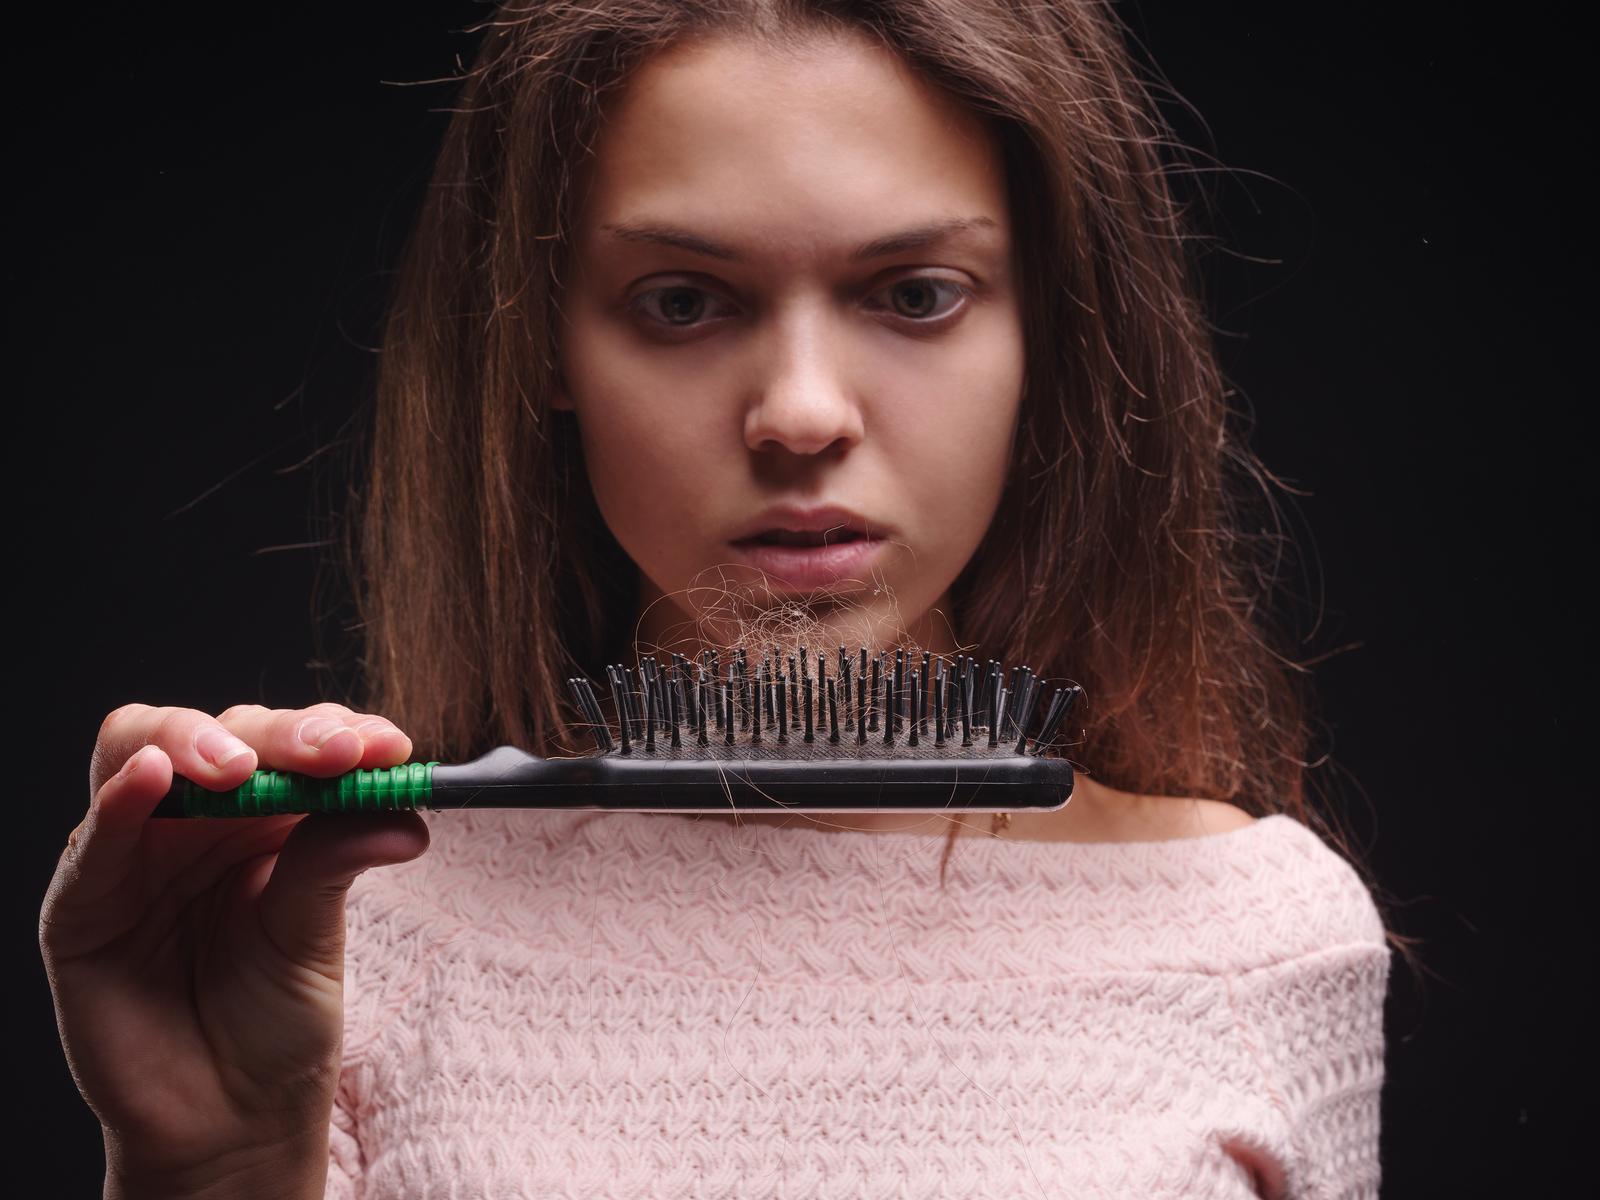 Beware of fake remy hair